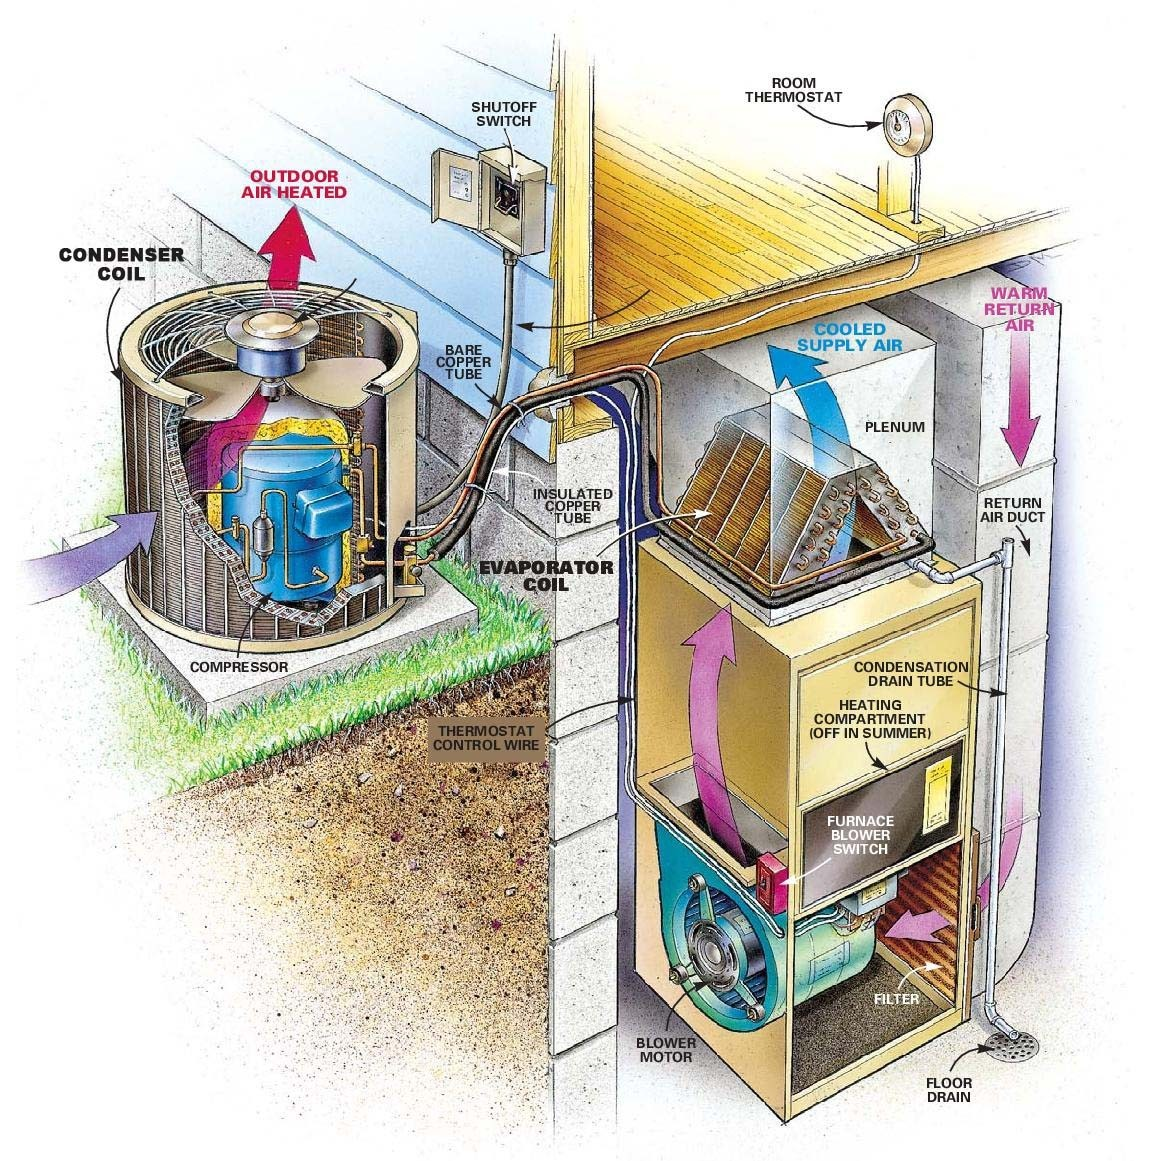 230 Volt Air Conditioner Wiring Diagram Hr Poster 3 Phase Compressor Get Free Image